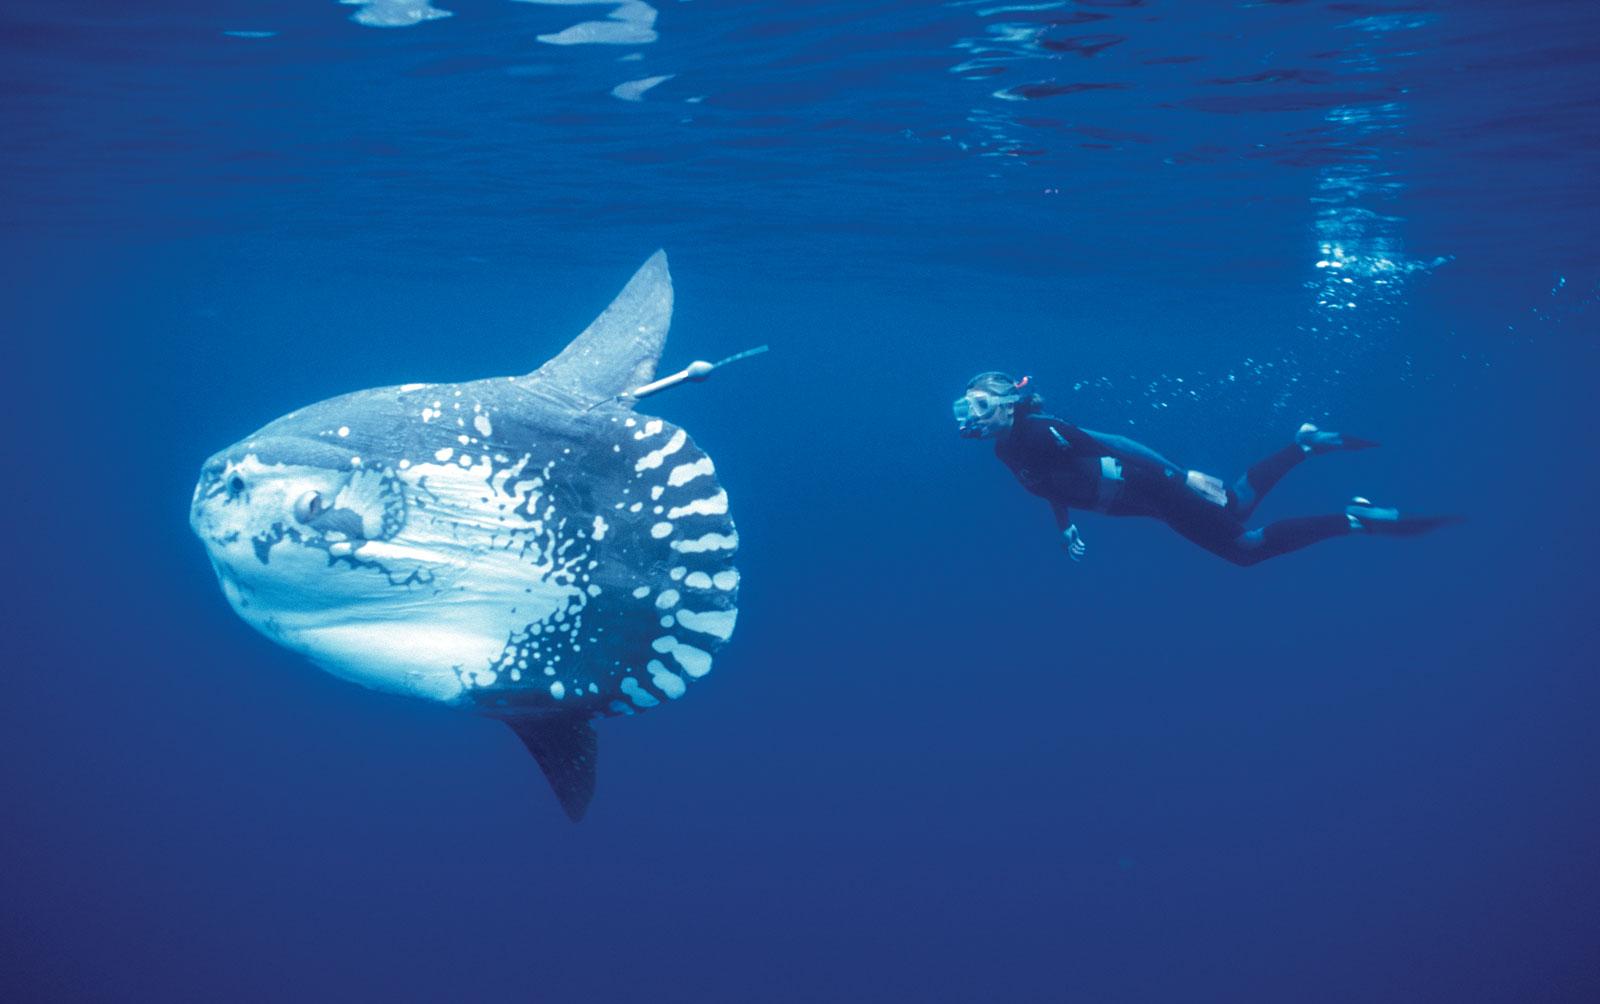 The Ocean Sunfish Snsh